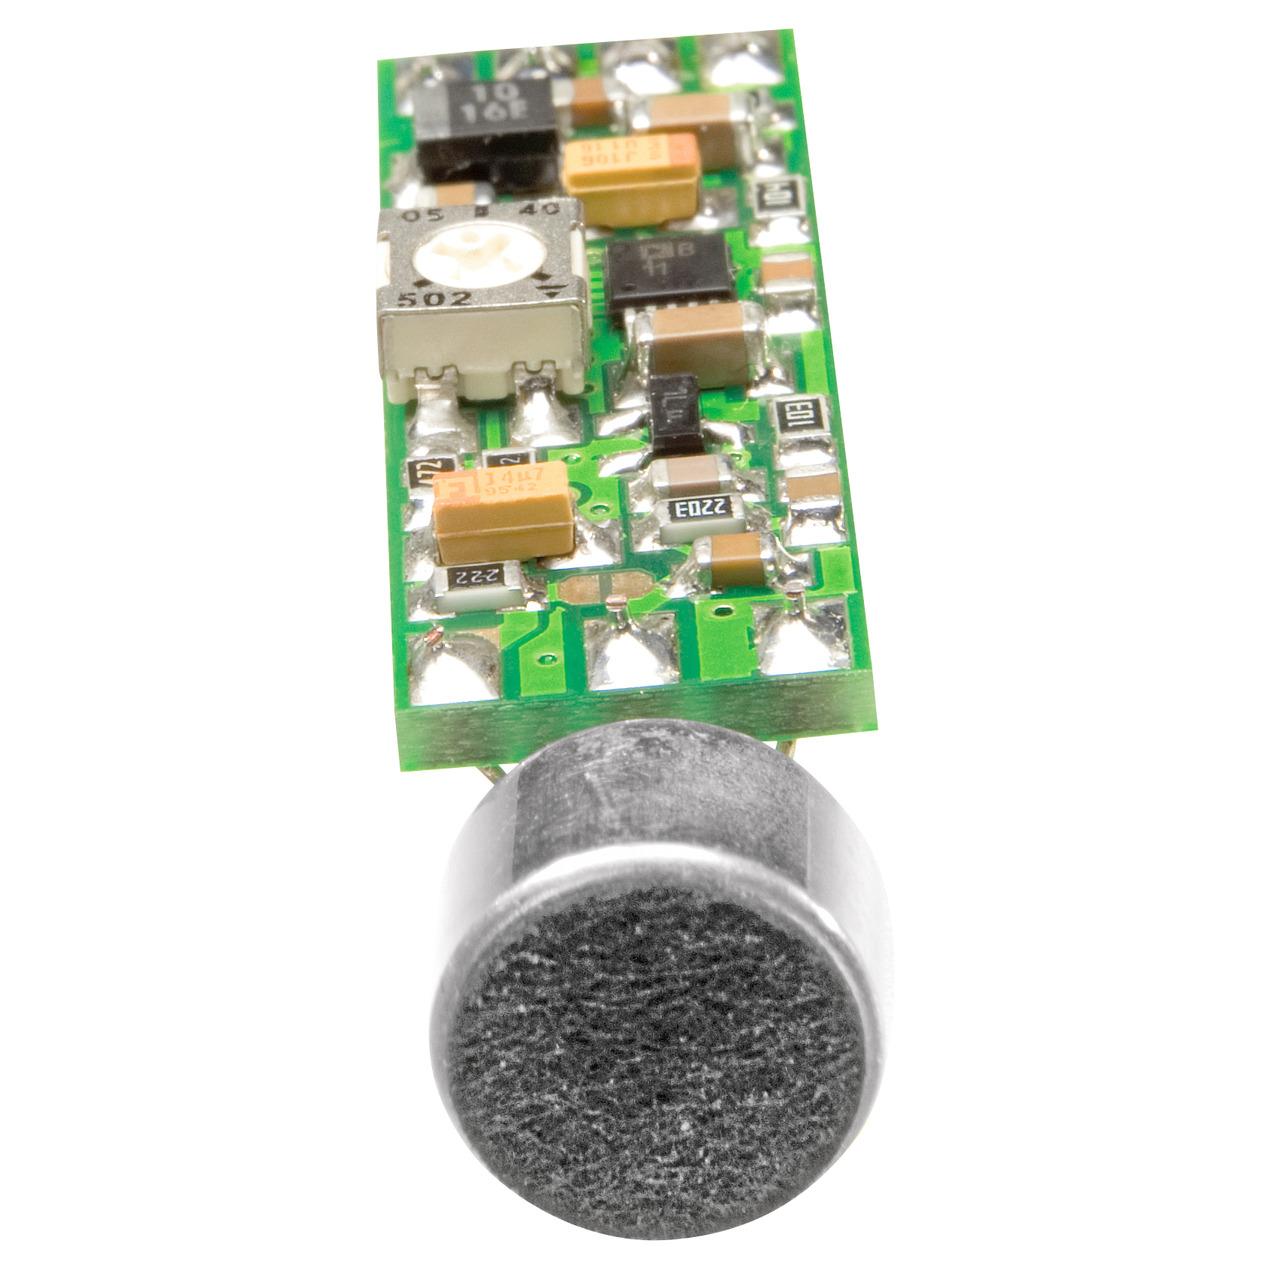 ELV Komplettbausatz SMD-Mikrofon-Vorverstärker SMV 5 mit Limiter